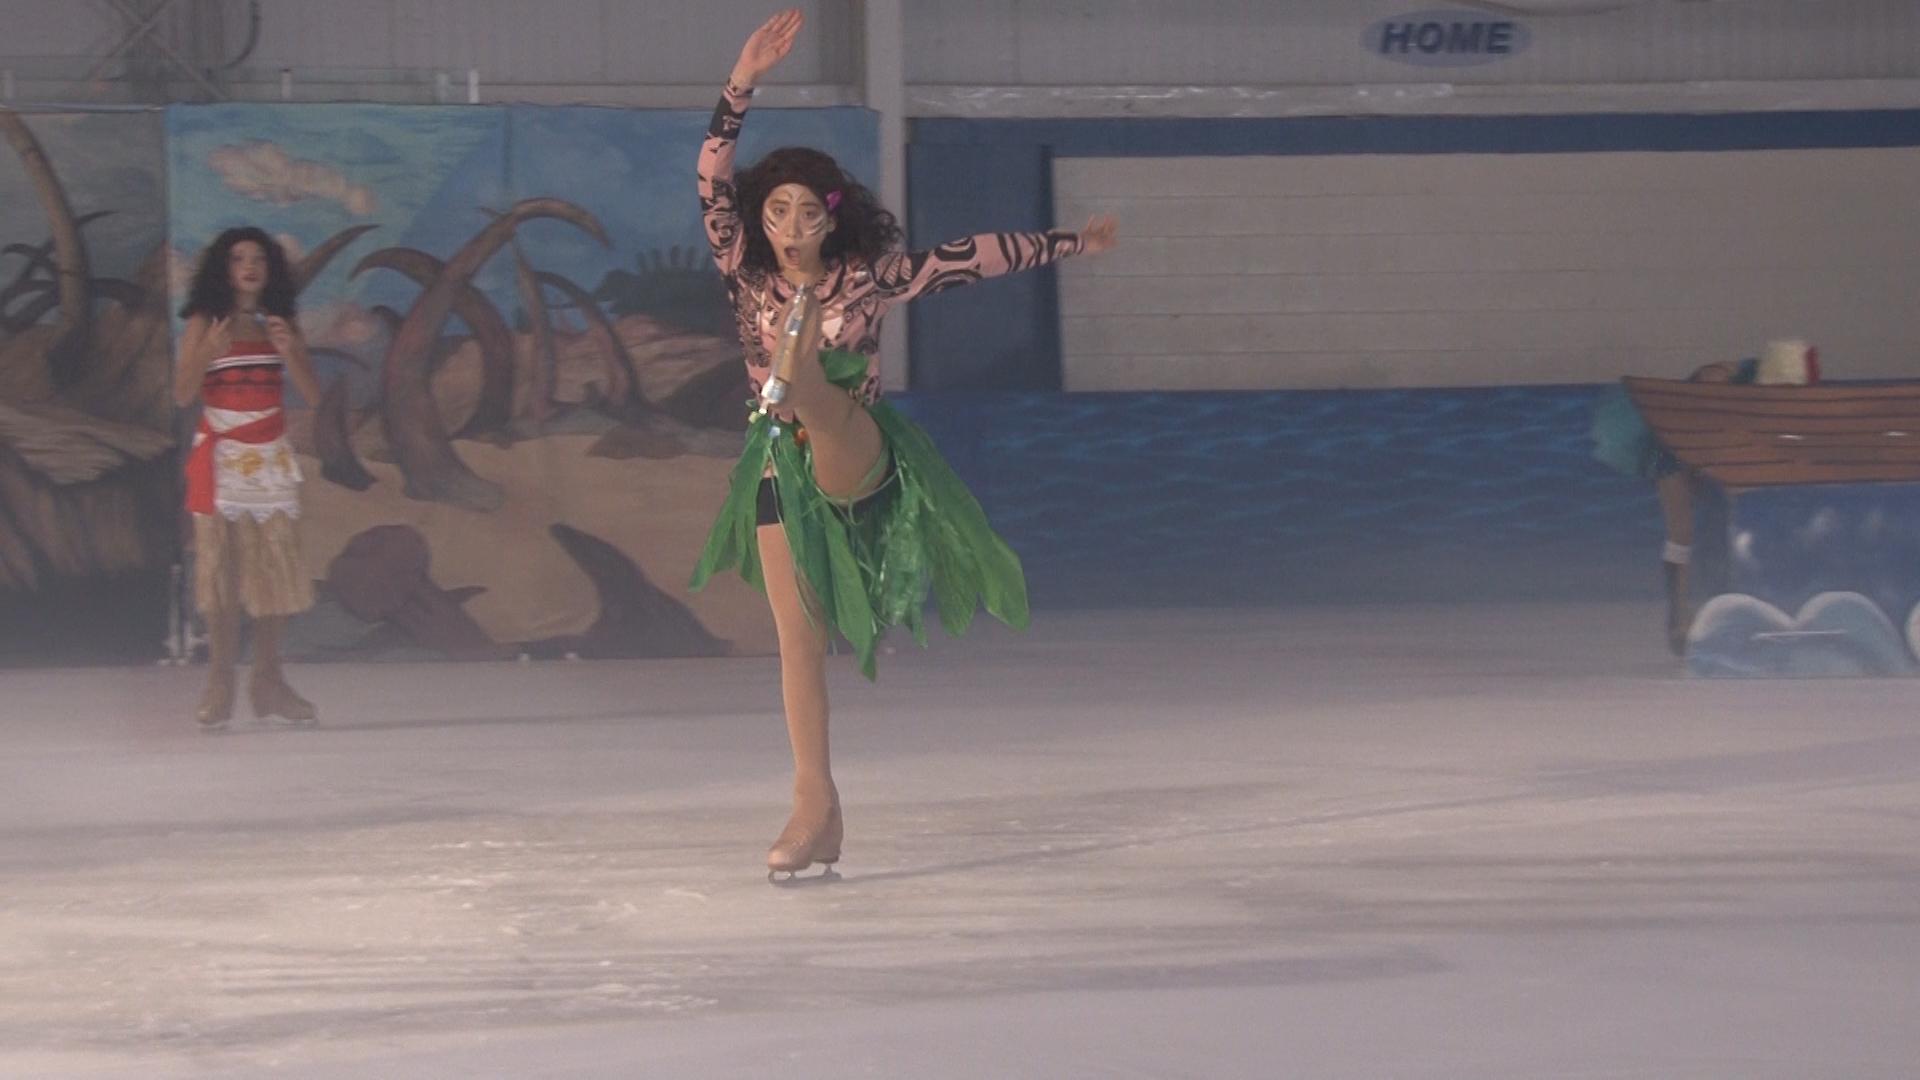 Power Play Maui Skate on Ice 071417.00_32_26_06.Still051.jpg